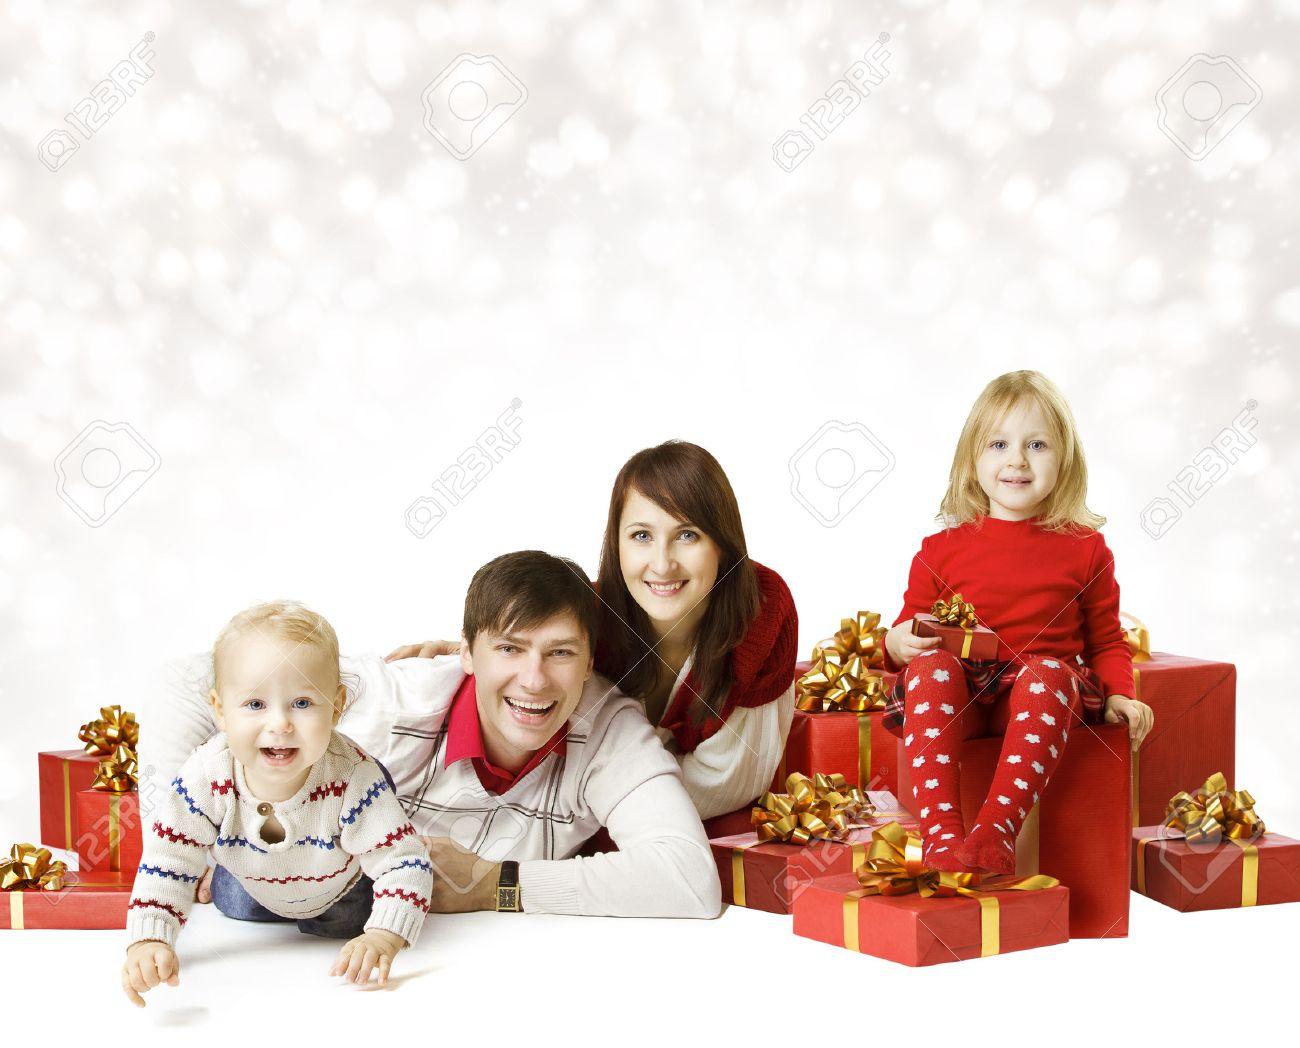 Christmas Family Photo Christmas Family Stock Photos Pictures Royalty Free Christmas